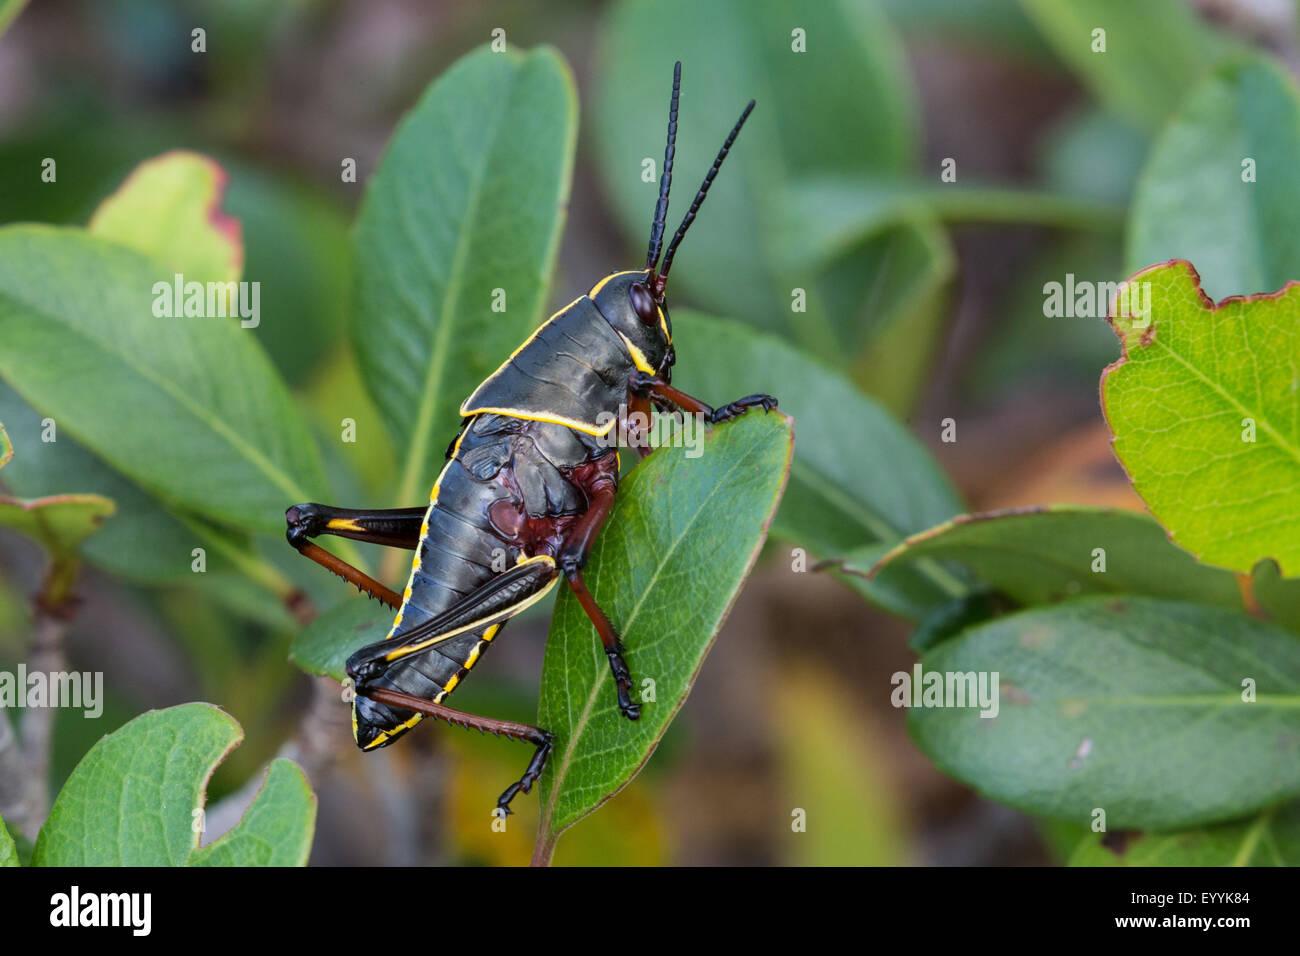 Östlichen Lümmel Grashüpfer (Romalea Microptera), Nymphe, USA, Florida Stockbild